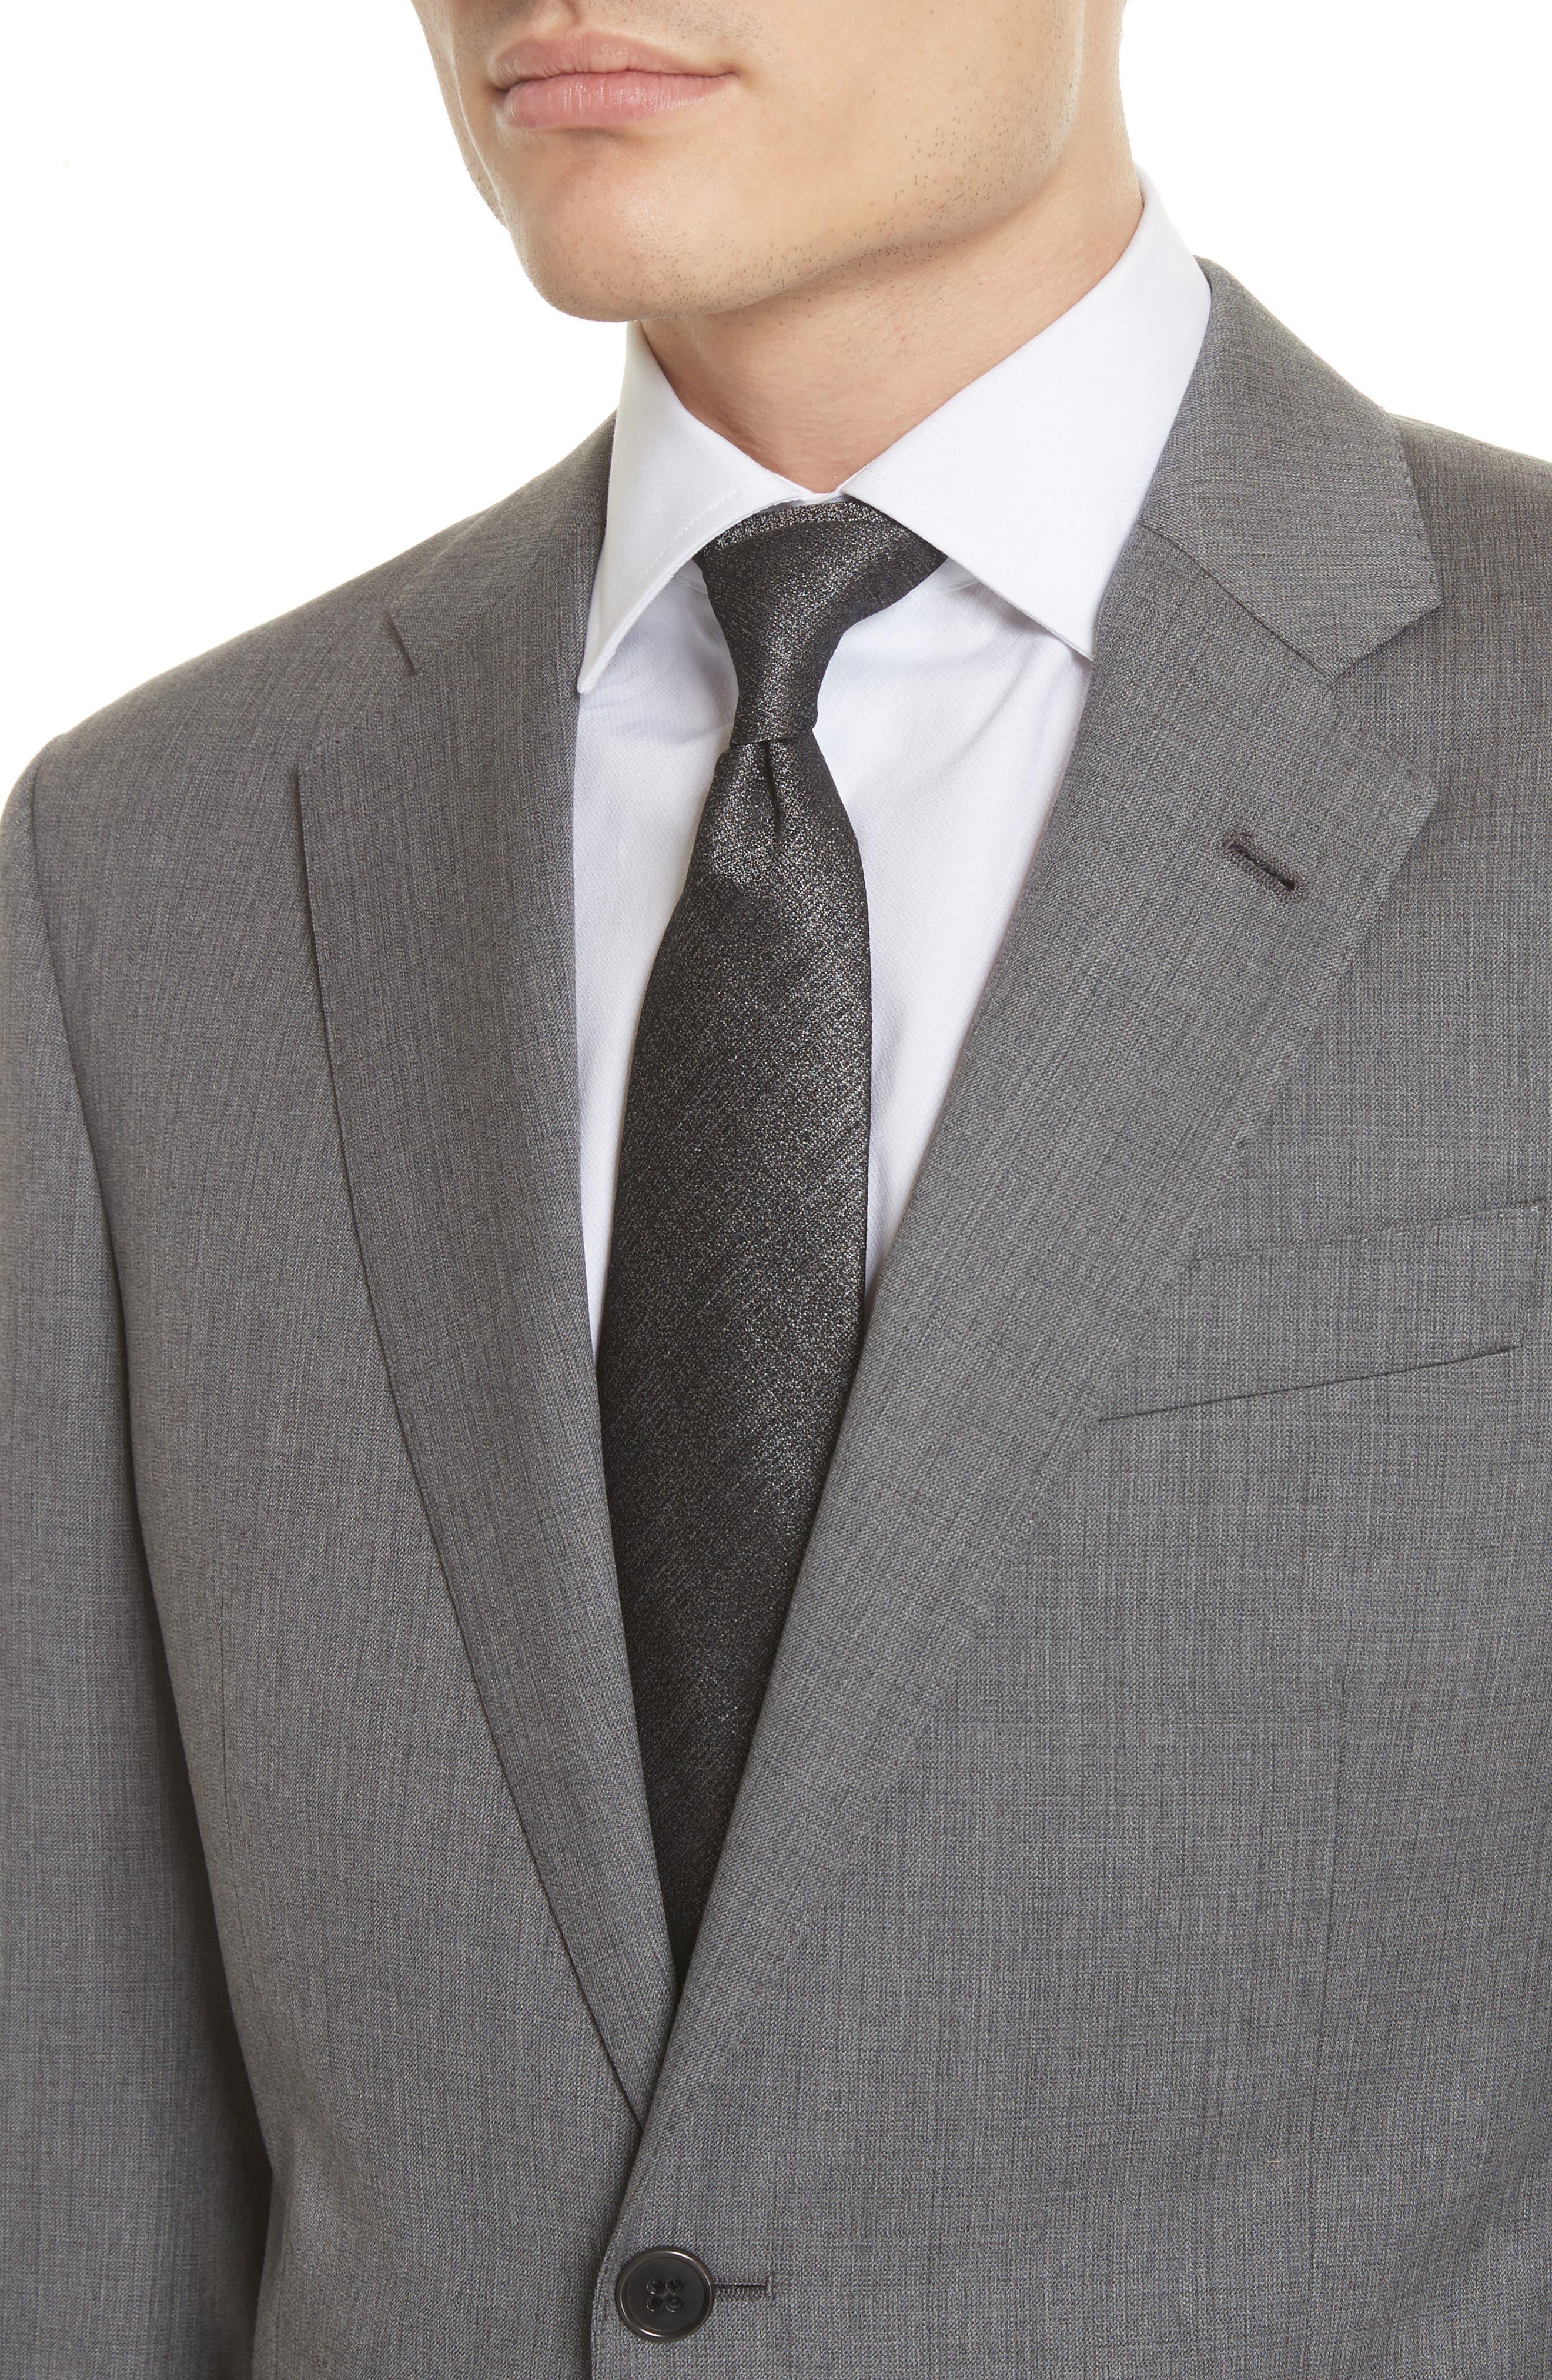 Trim Fit Sharkskin Wool Suit,                             Alternate thumbnail 4, color,                             Grey